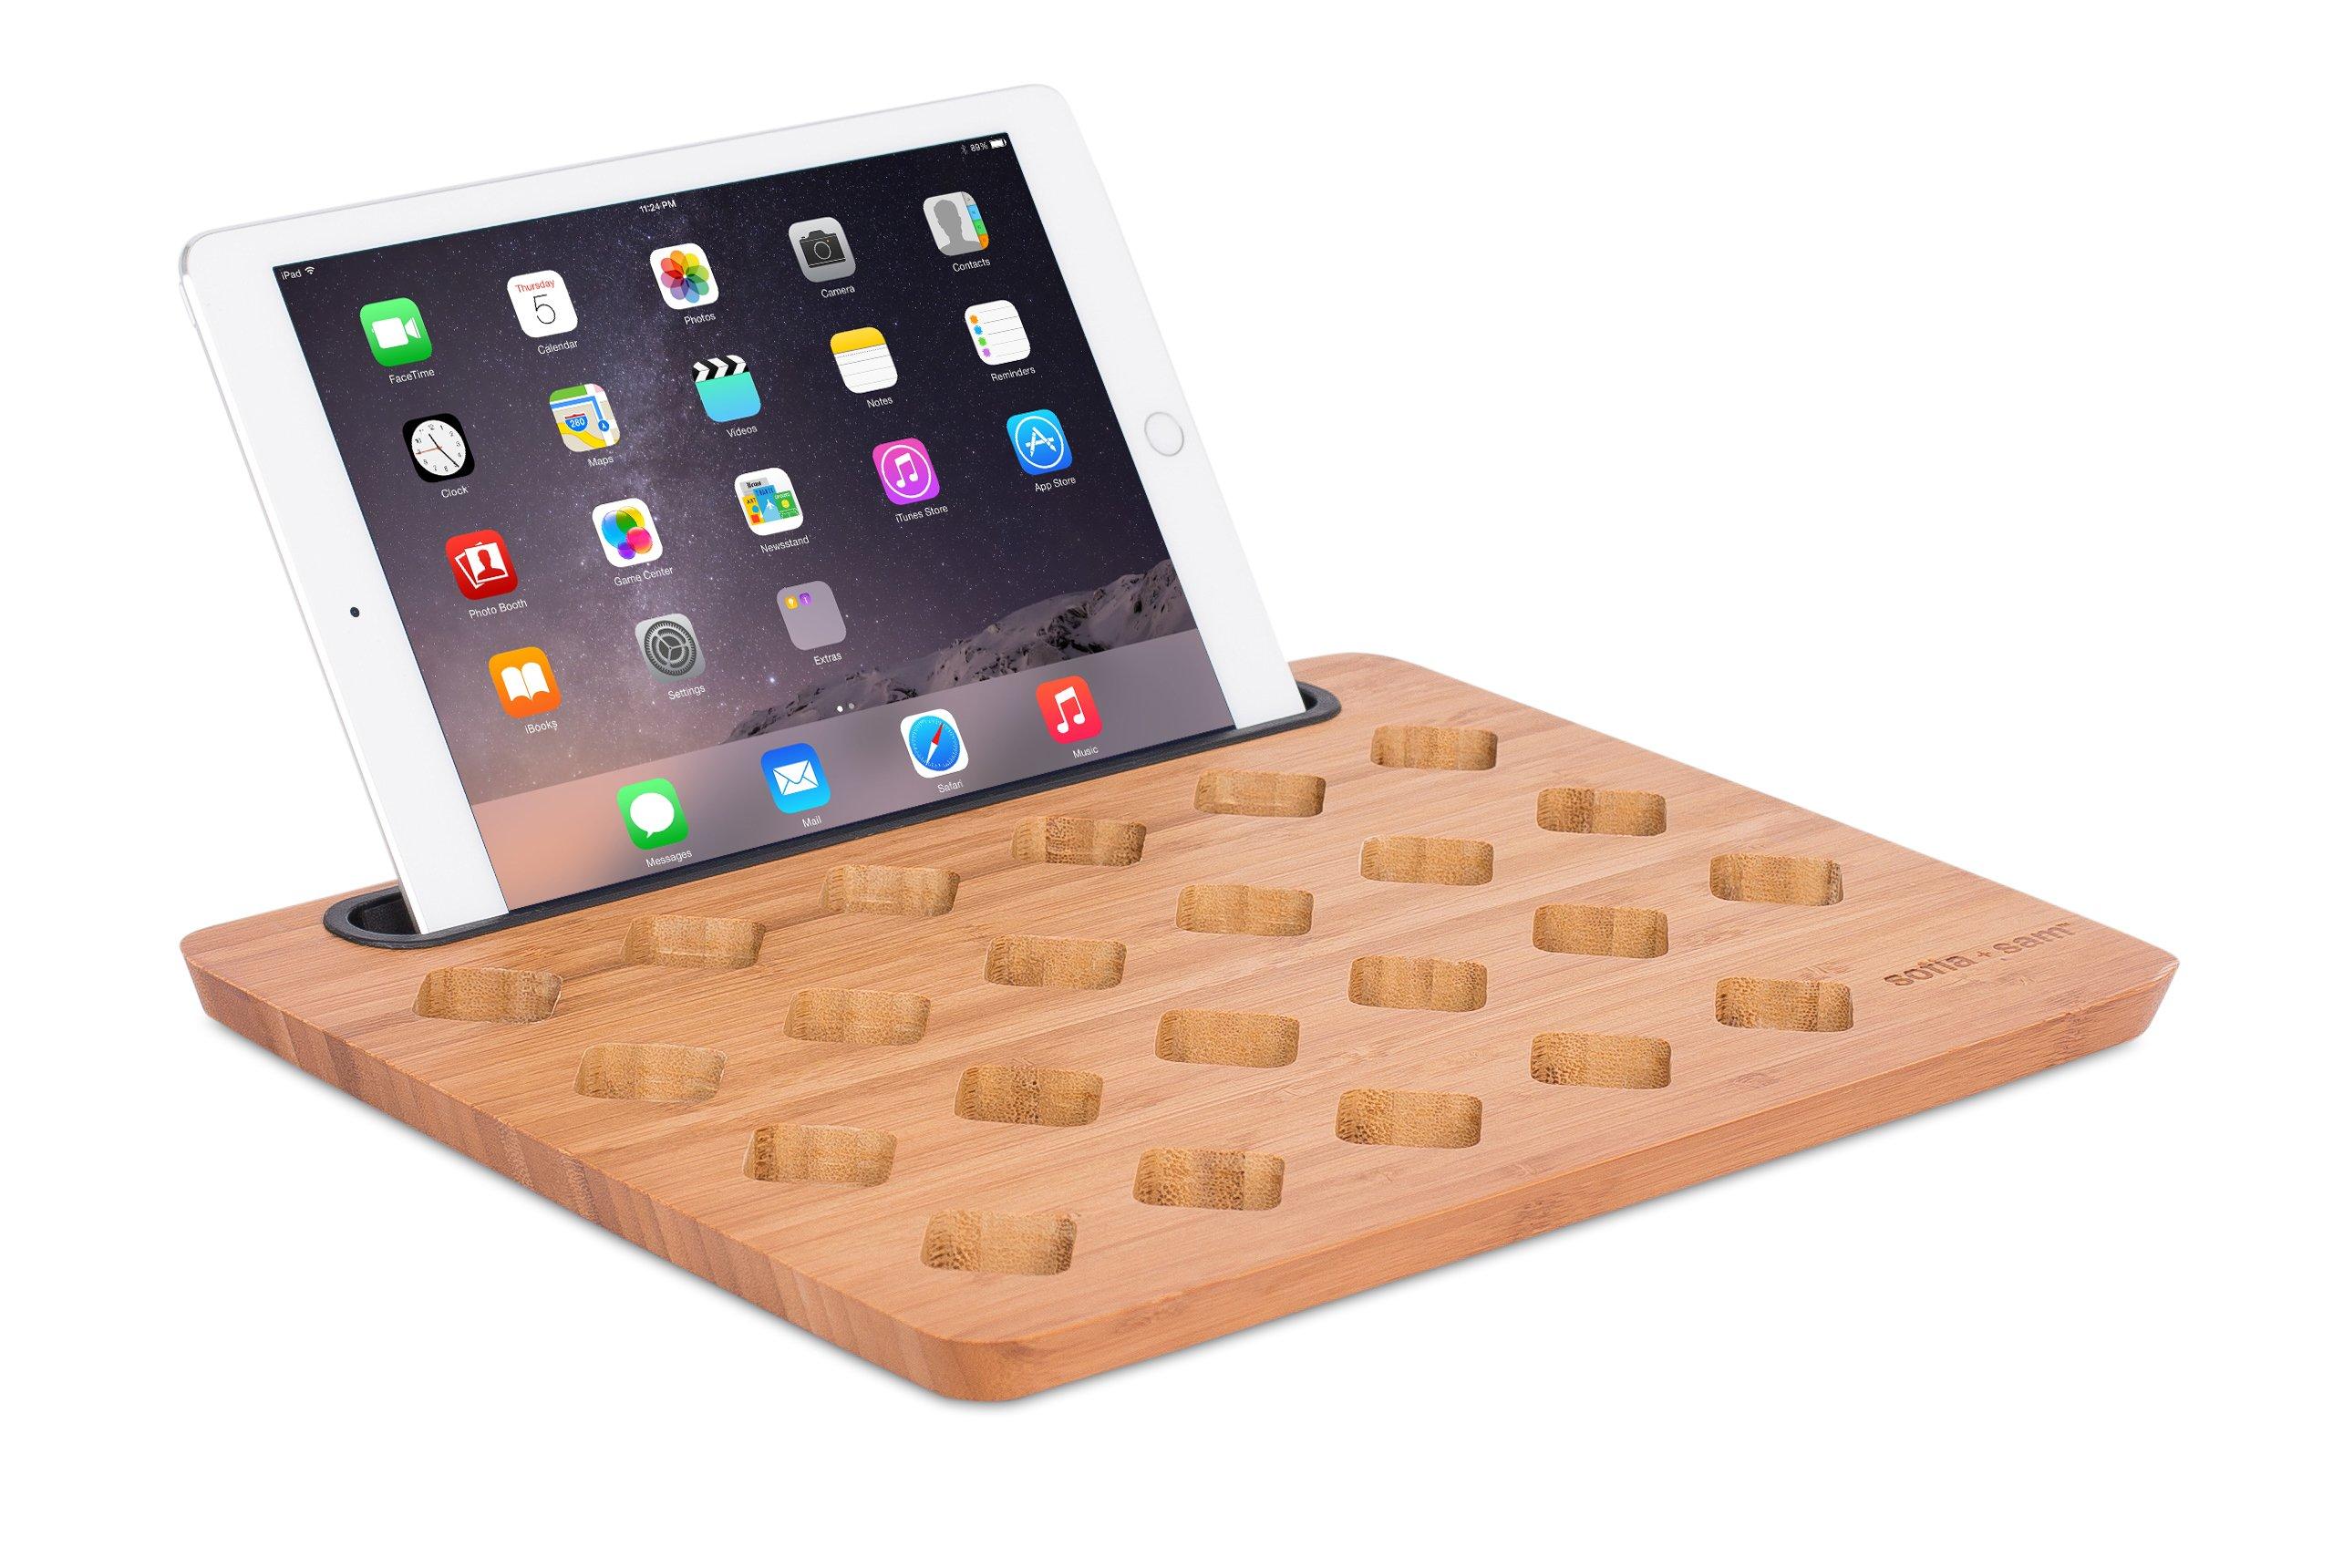 Sofia + Sam Bamboo Tablet Stand & Mini Lap Desk Board | Mini Lap Tray | Diamond Vent Holes | Tablet Slot | Fits 13 Inch Laptop